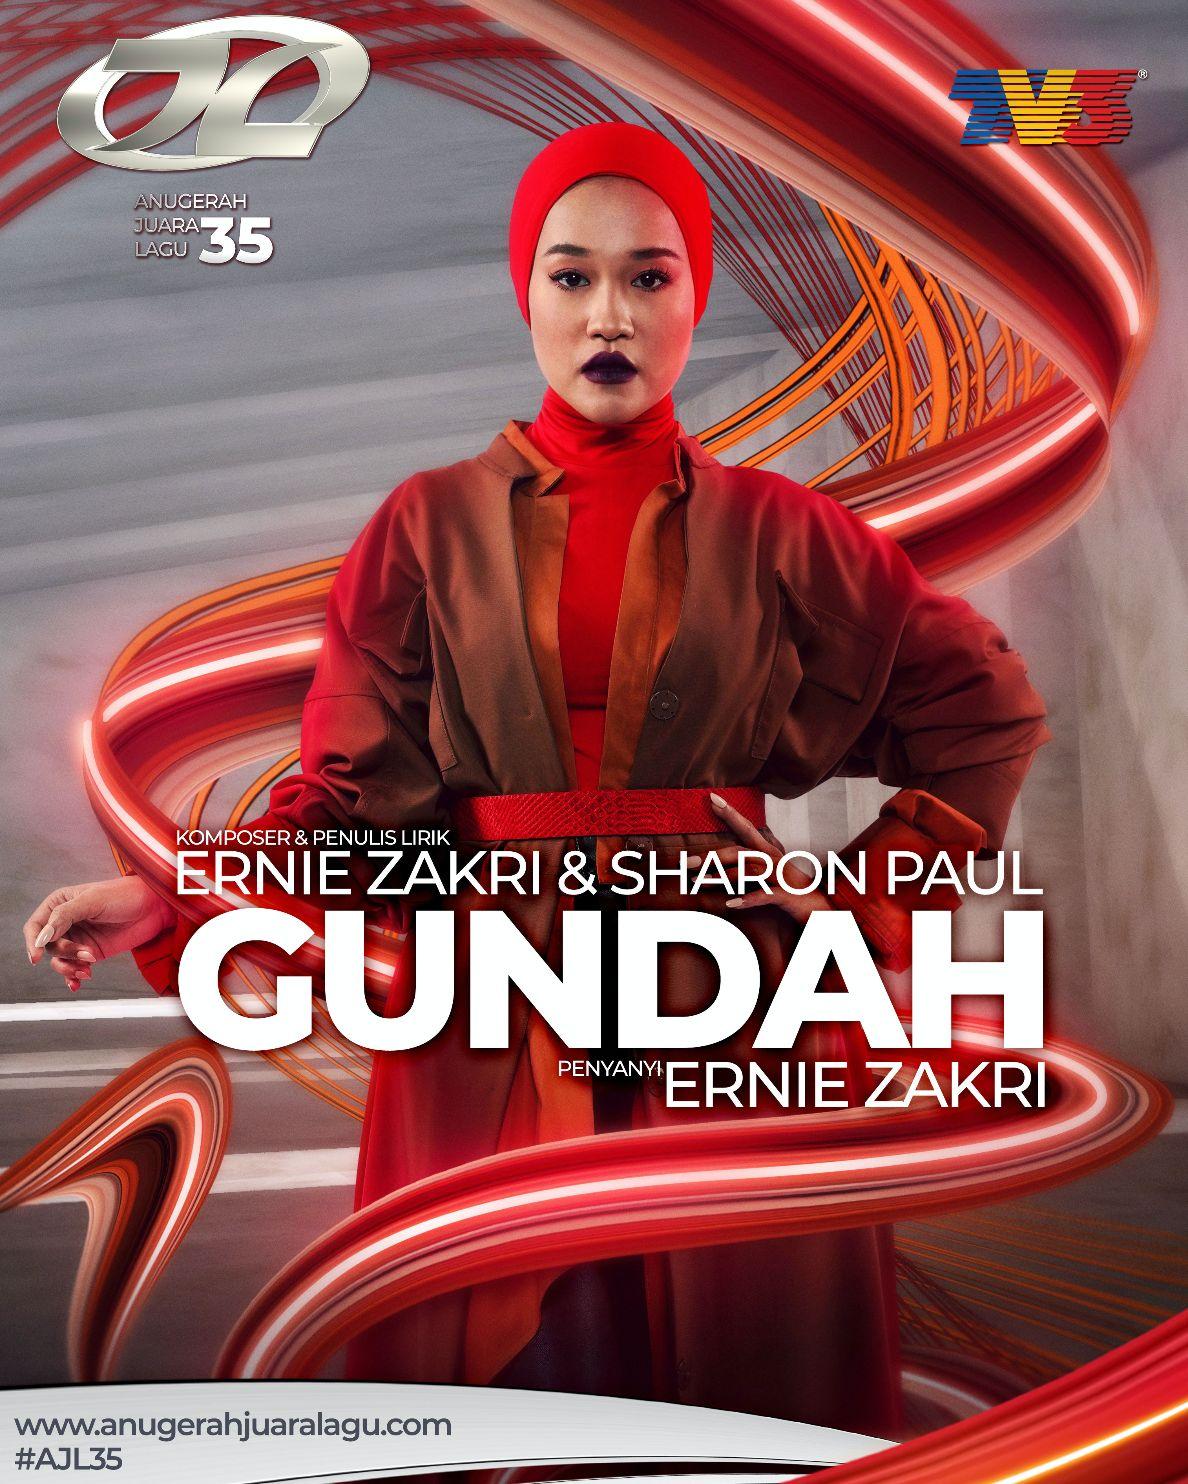 Gundah - Ernie Zakri